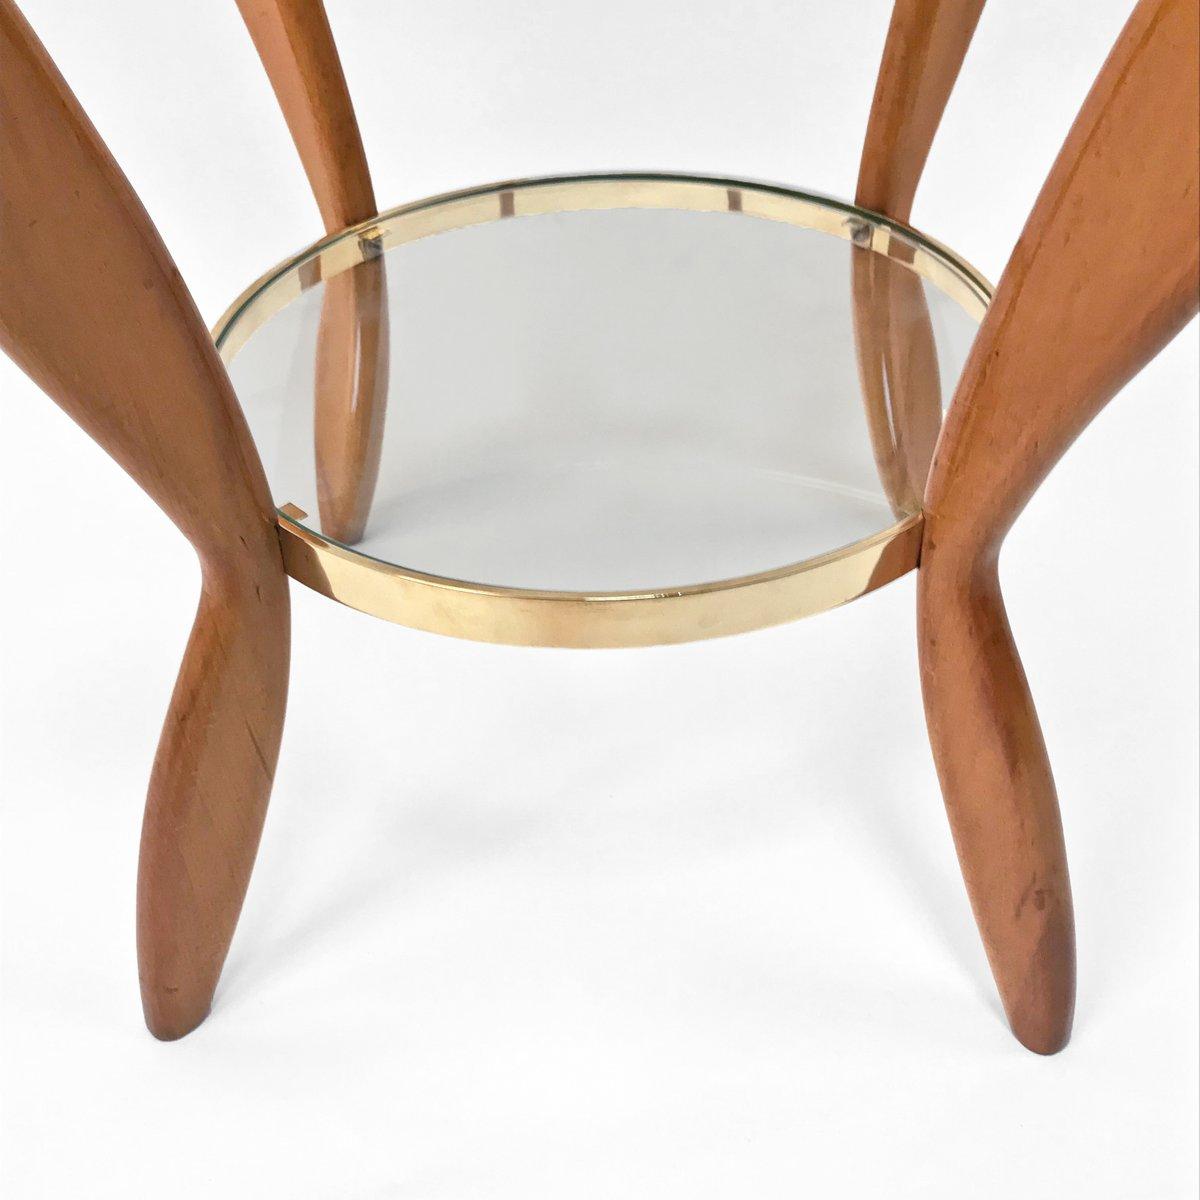 Beech Wood Coffee Table: Italian Beech, Brass & Glass Coffee Table, 1950s For Sale